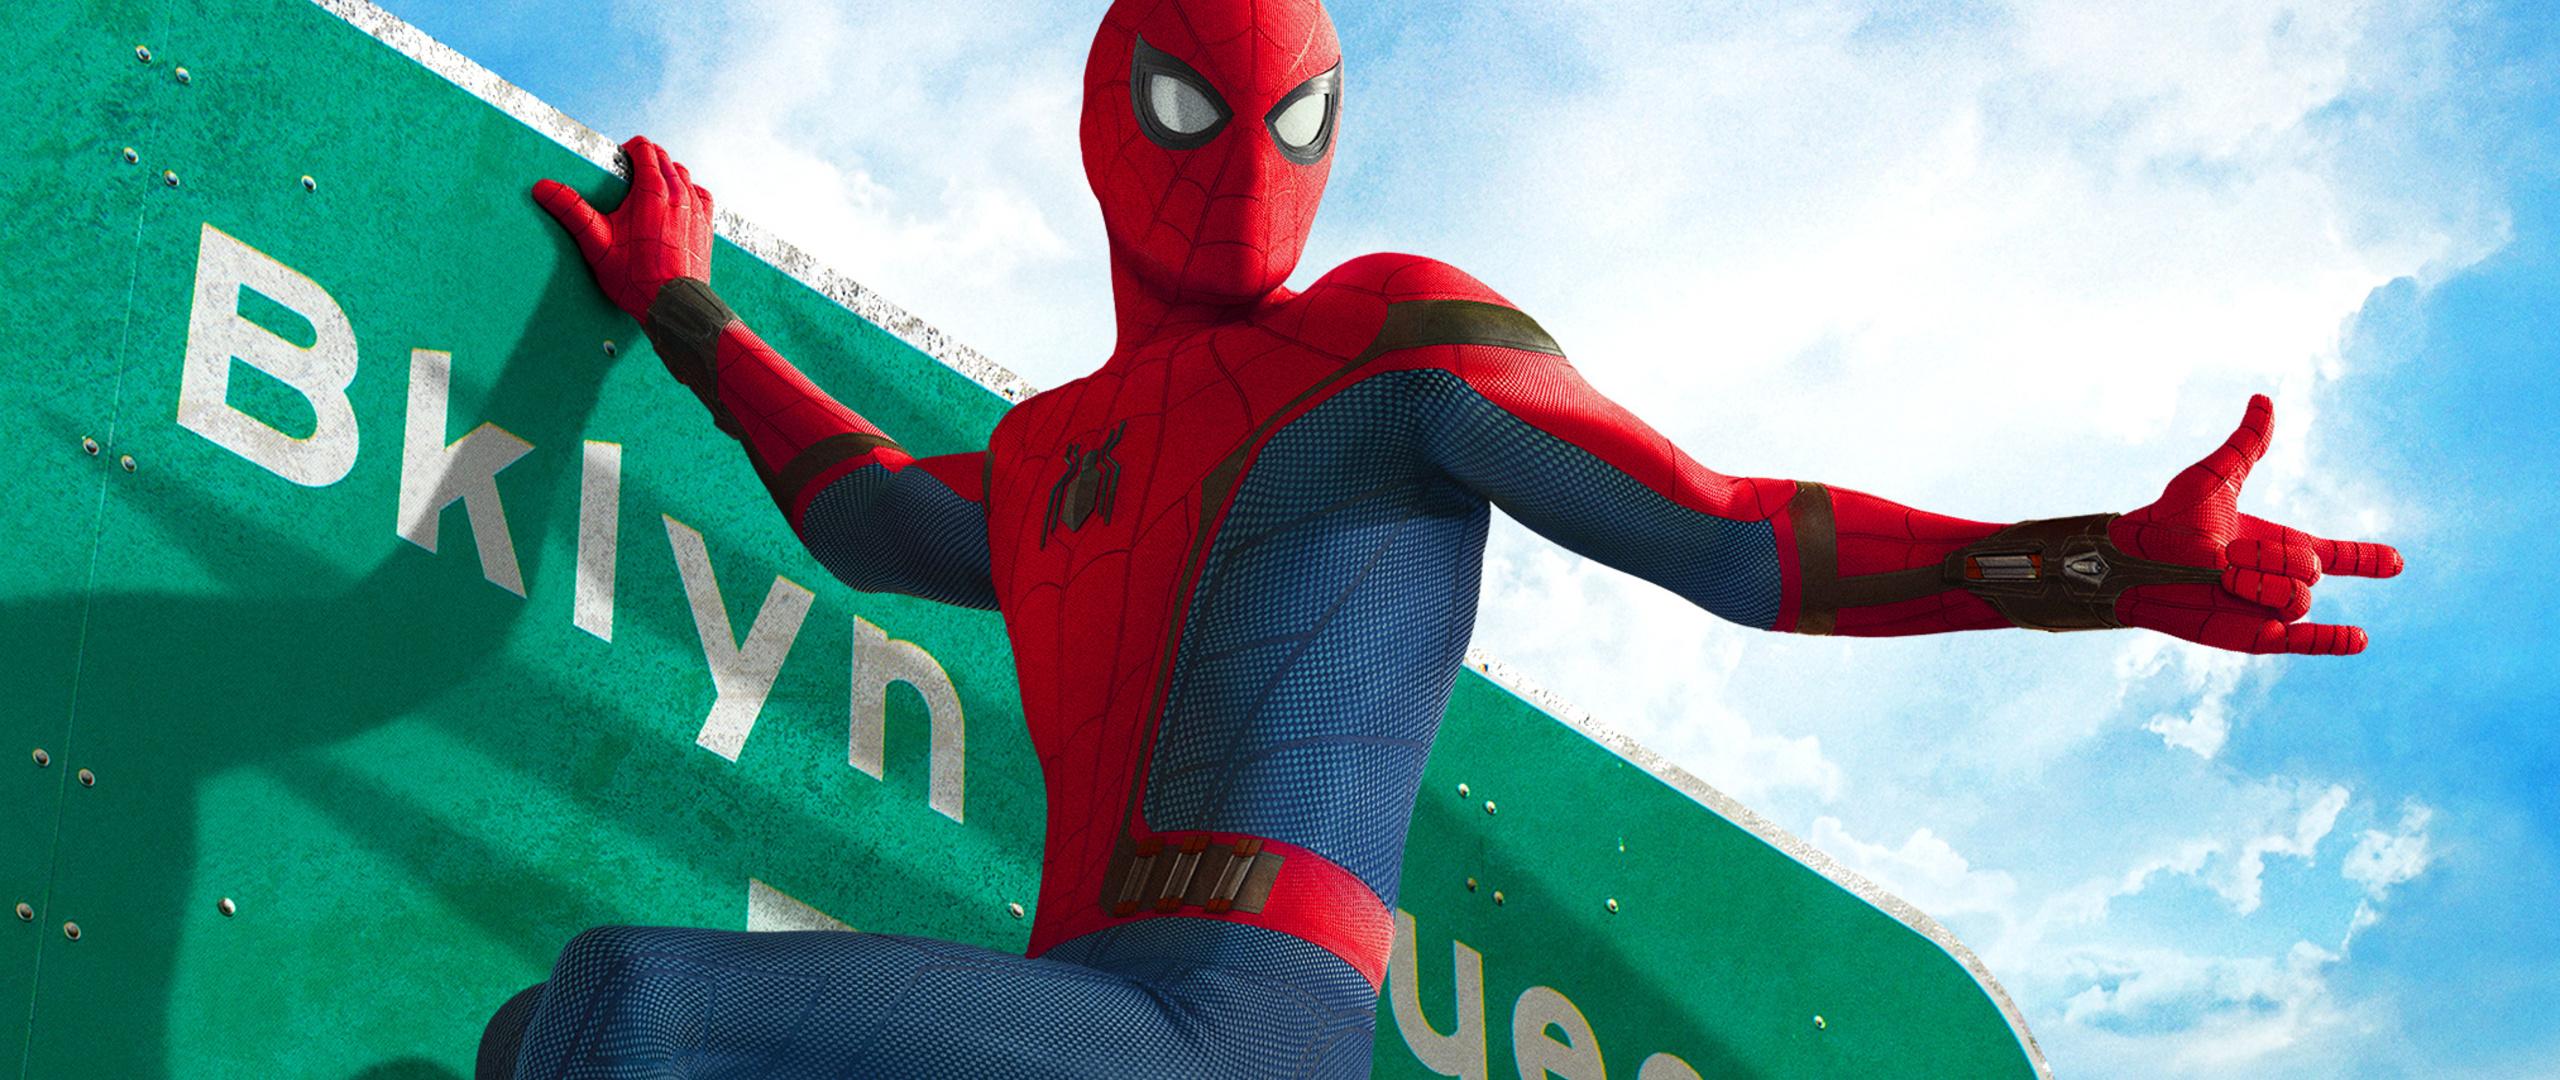 spiderman-homecoming-hd-qhd.jpg